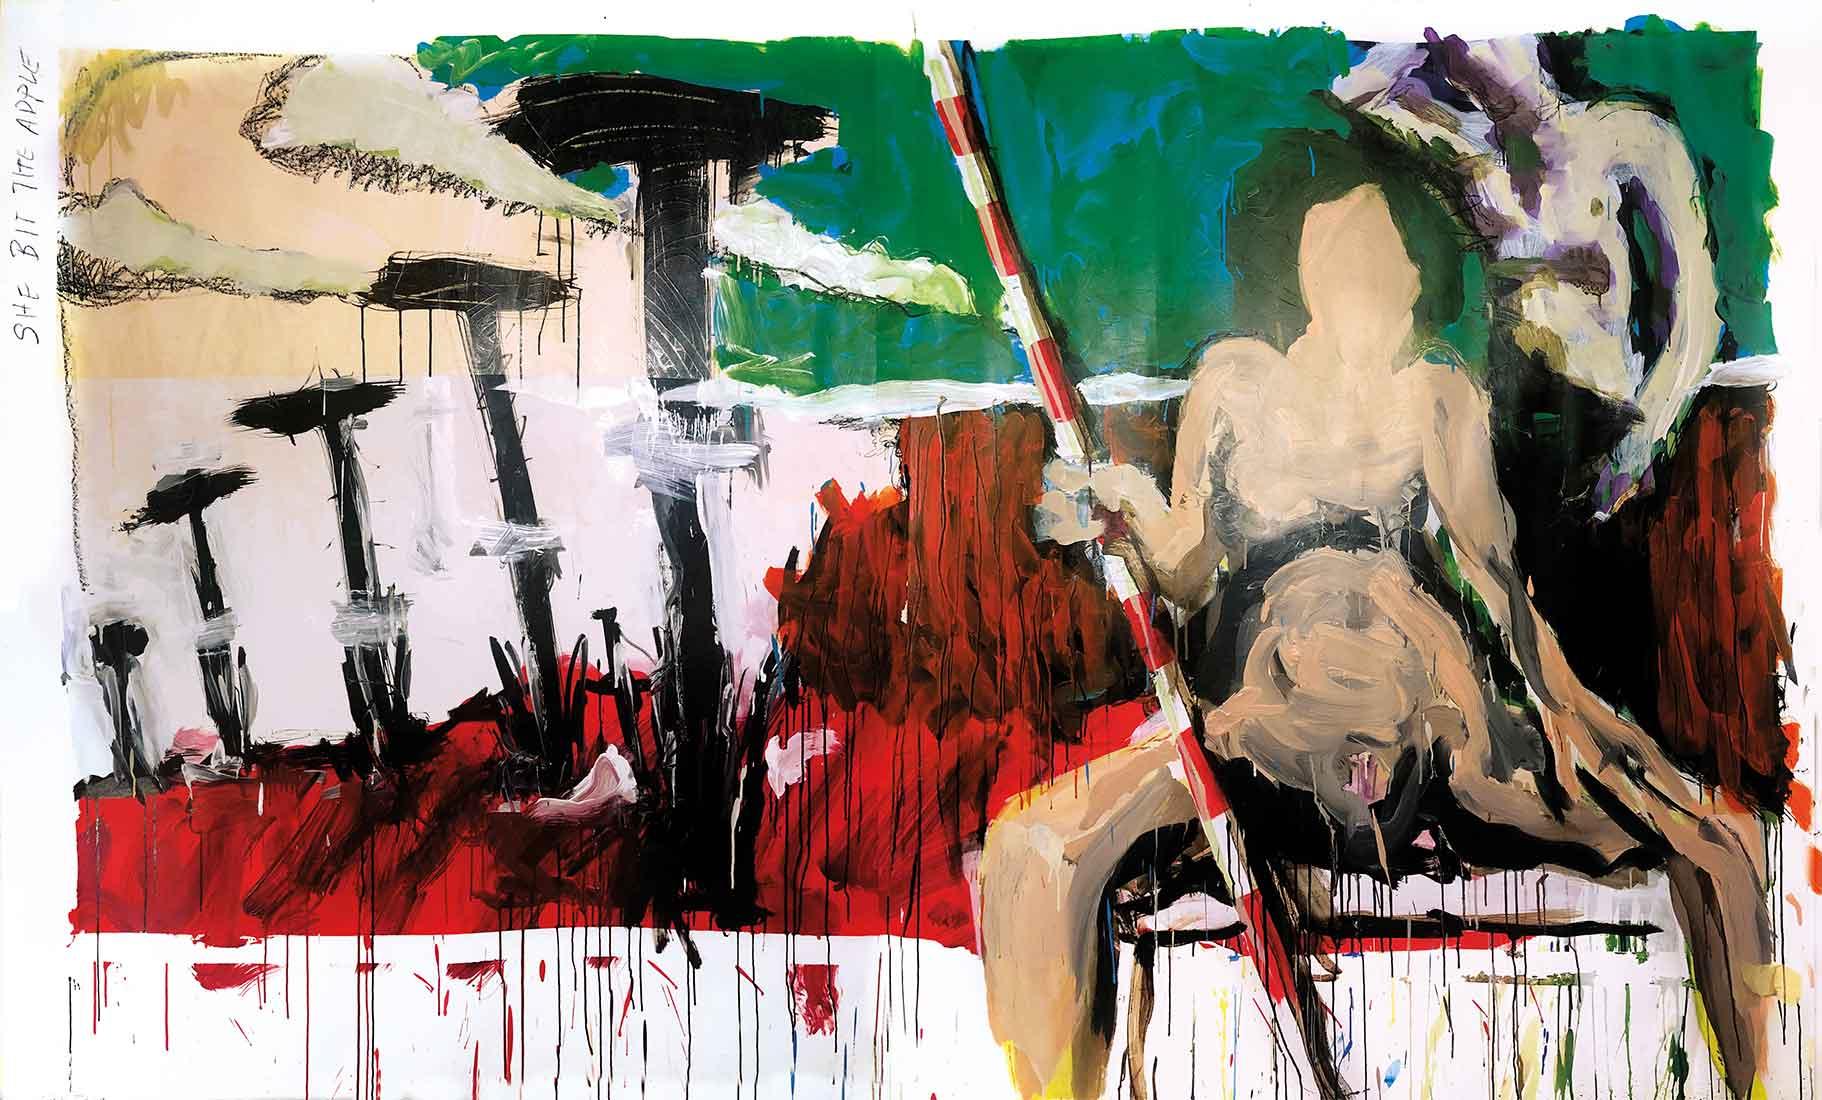 where-is-the-apple-tree-mongi-higgs-artwork-gemaelde-konsum163-galerie-modern-art-gallery